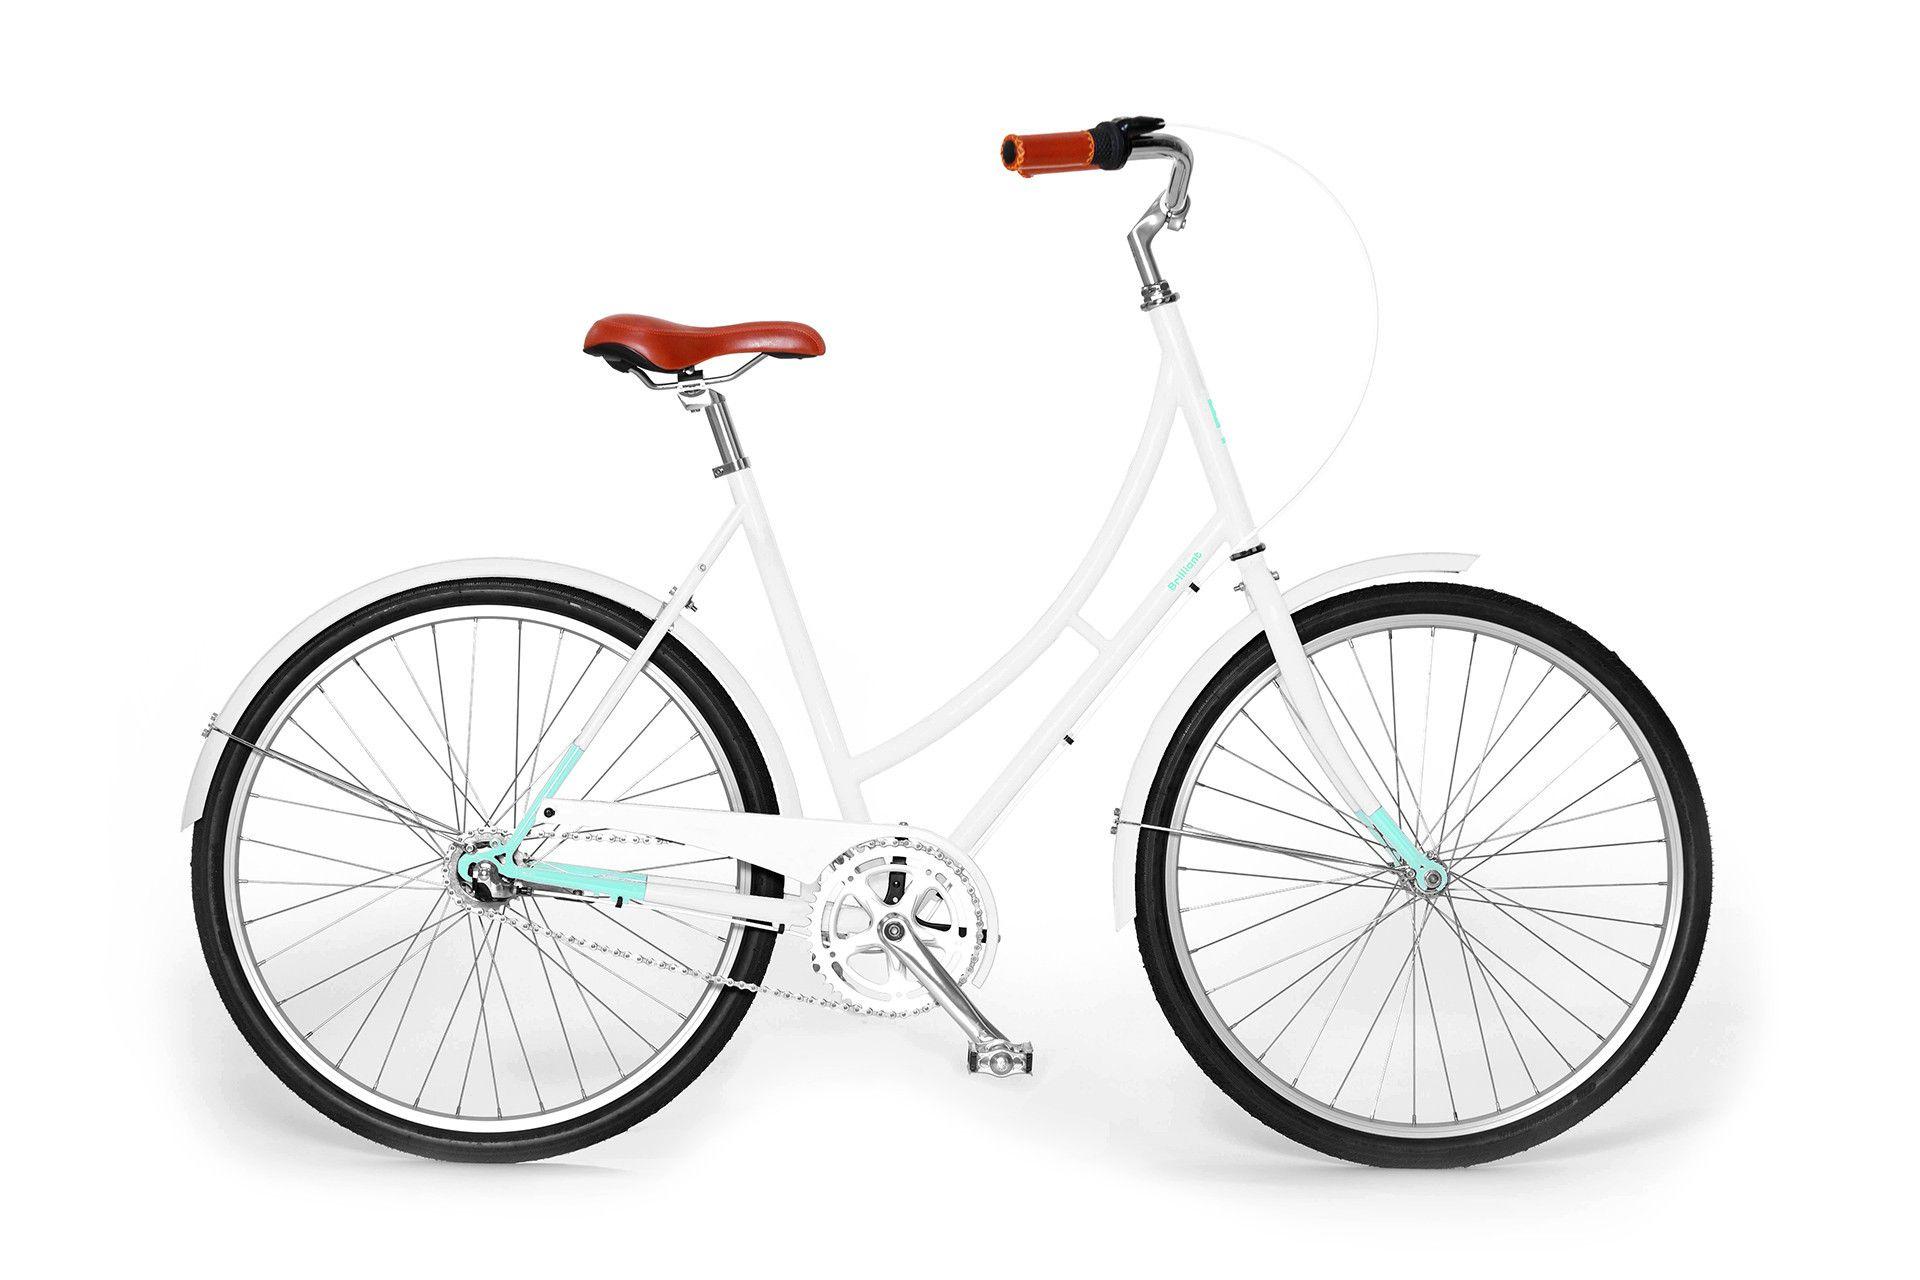 Mayfair Bicycle Cruiser Bicycle Bike